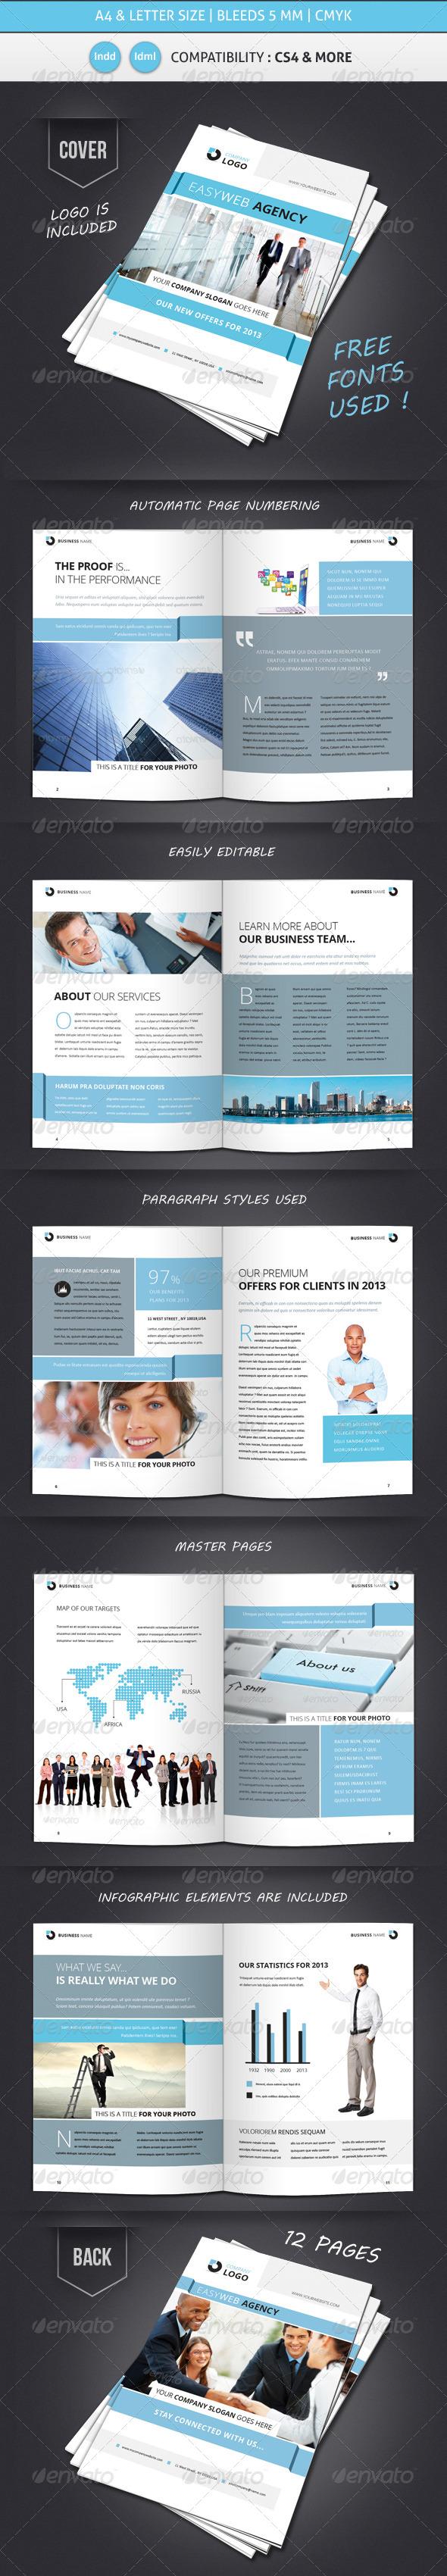 GraphicRiver Corporate & Business Brochure Template Design 4416032